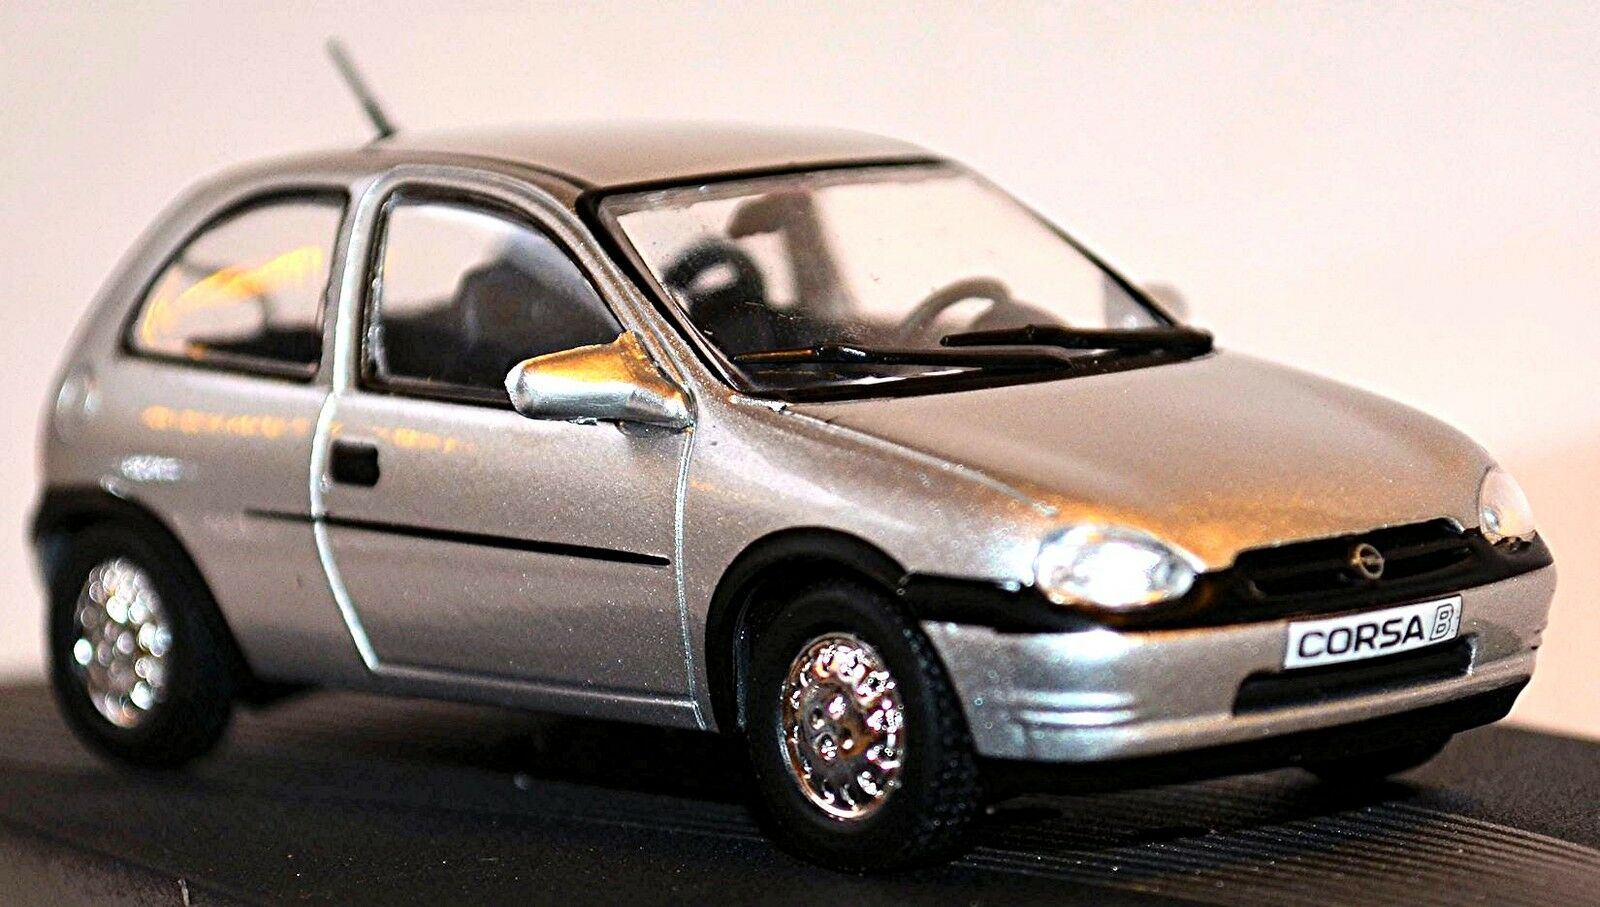 Opel Corsa B 1993-2000 argent métallique 1 43 Concepteur Série Hideo Kodama